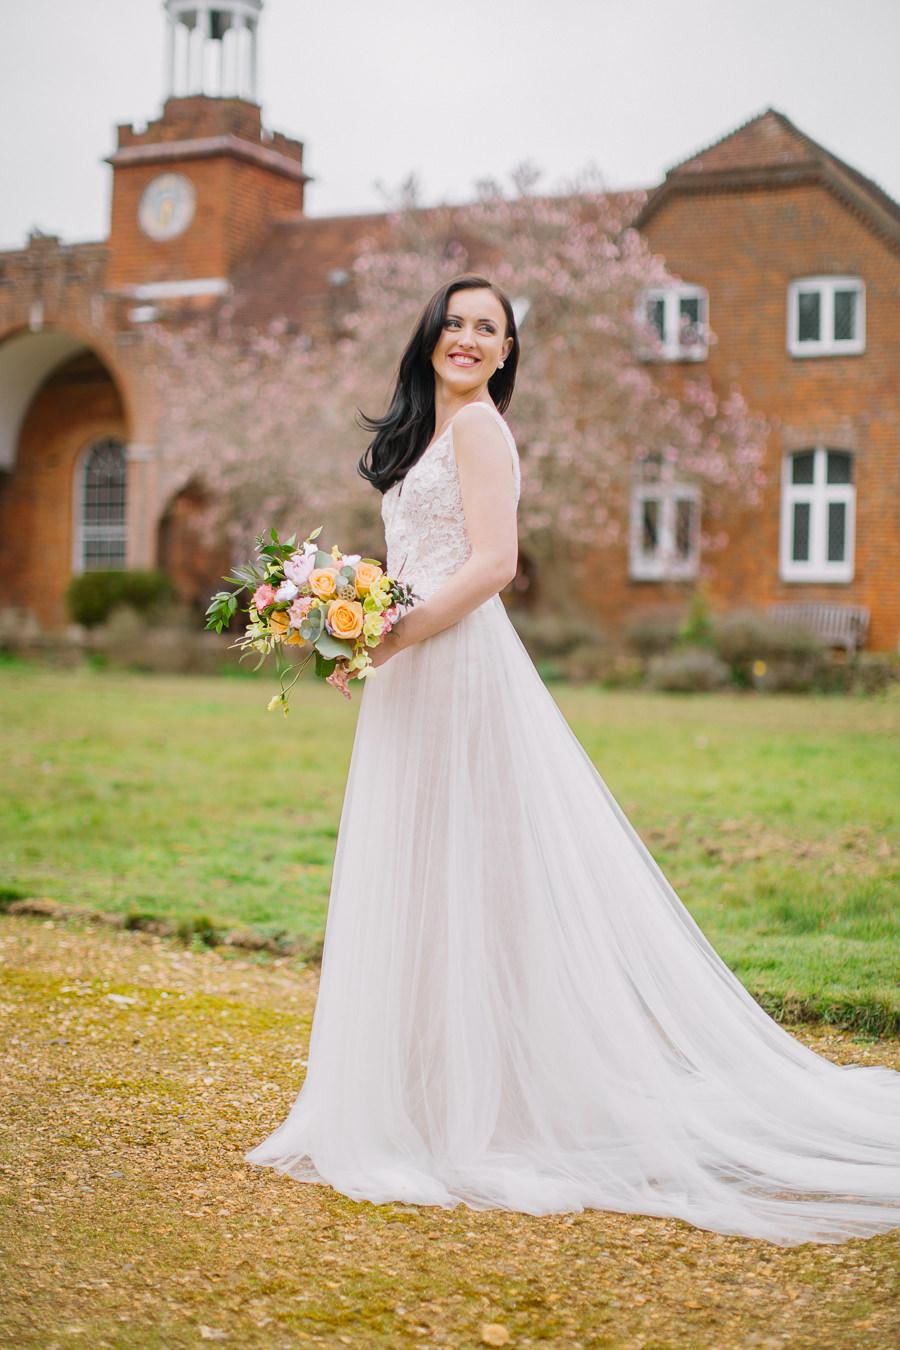 'Understated Elegance' Spring Styled Hampshire Bridal Shoot – Rownhams House, photo credit Nisha Haq Photography (14)